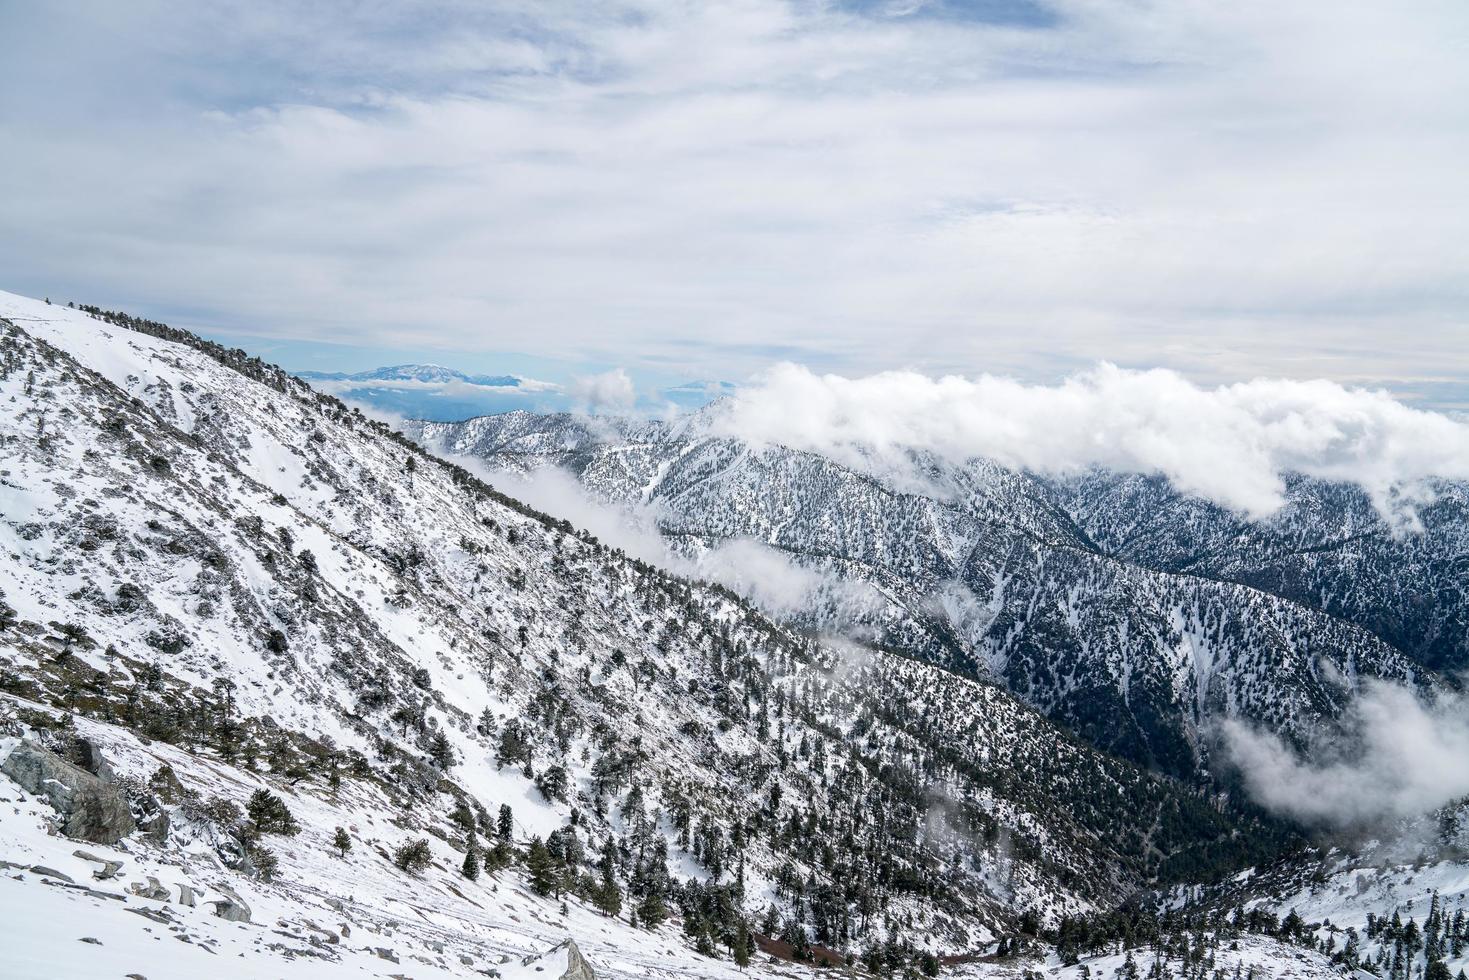 mt. kale kom bedekt met sneeuw in Californië foto